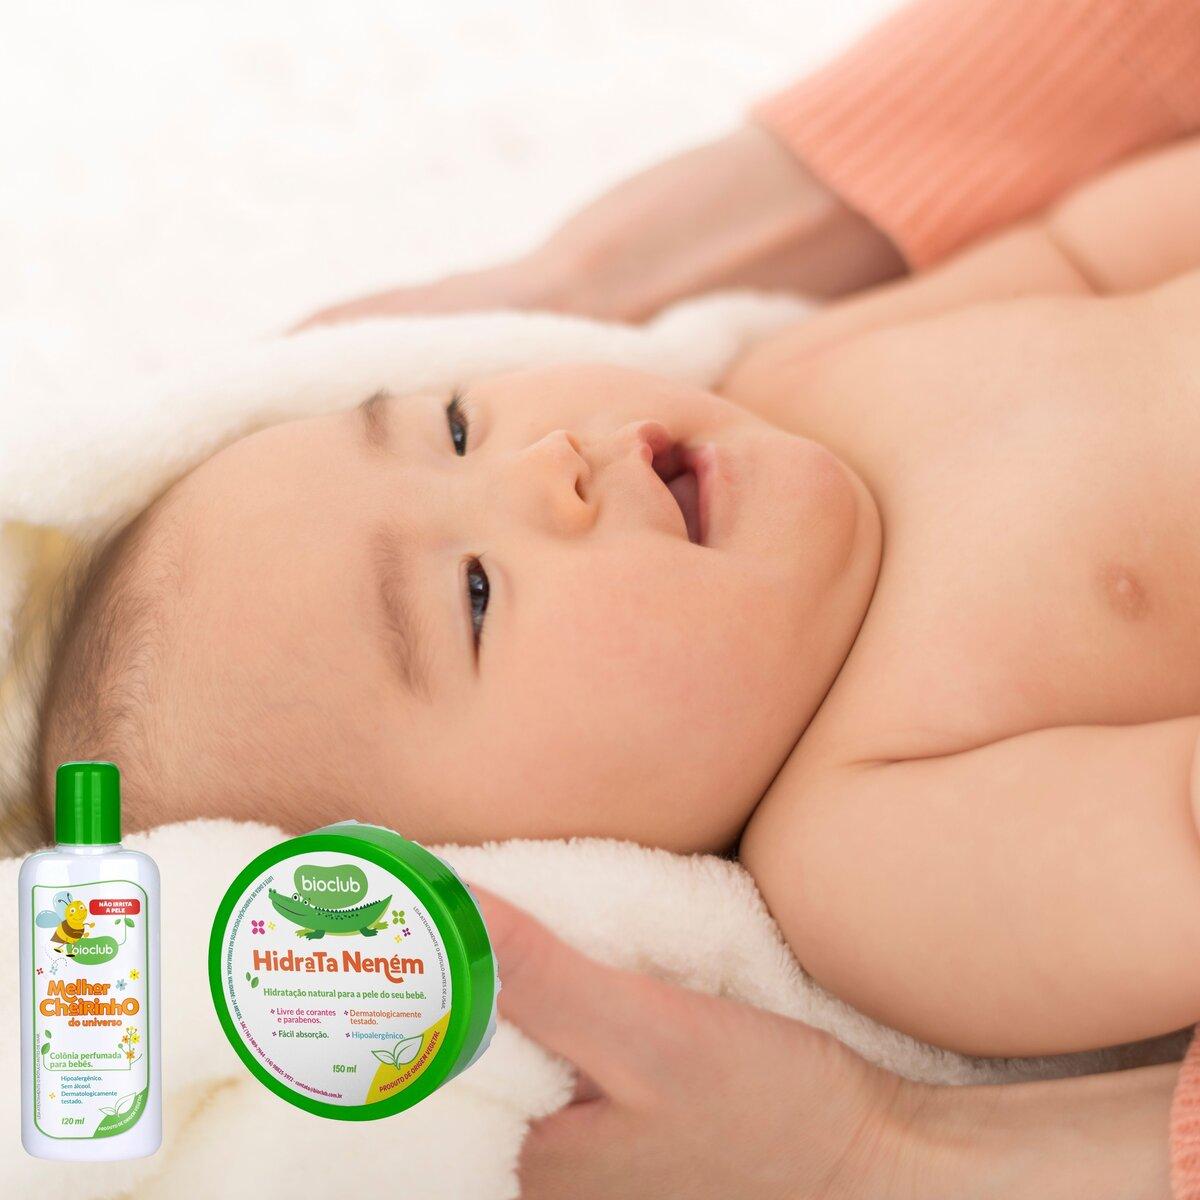 Kit Pós Banho Colonia e Hidratante Bebê Infantil BioClub